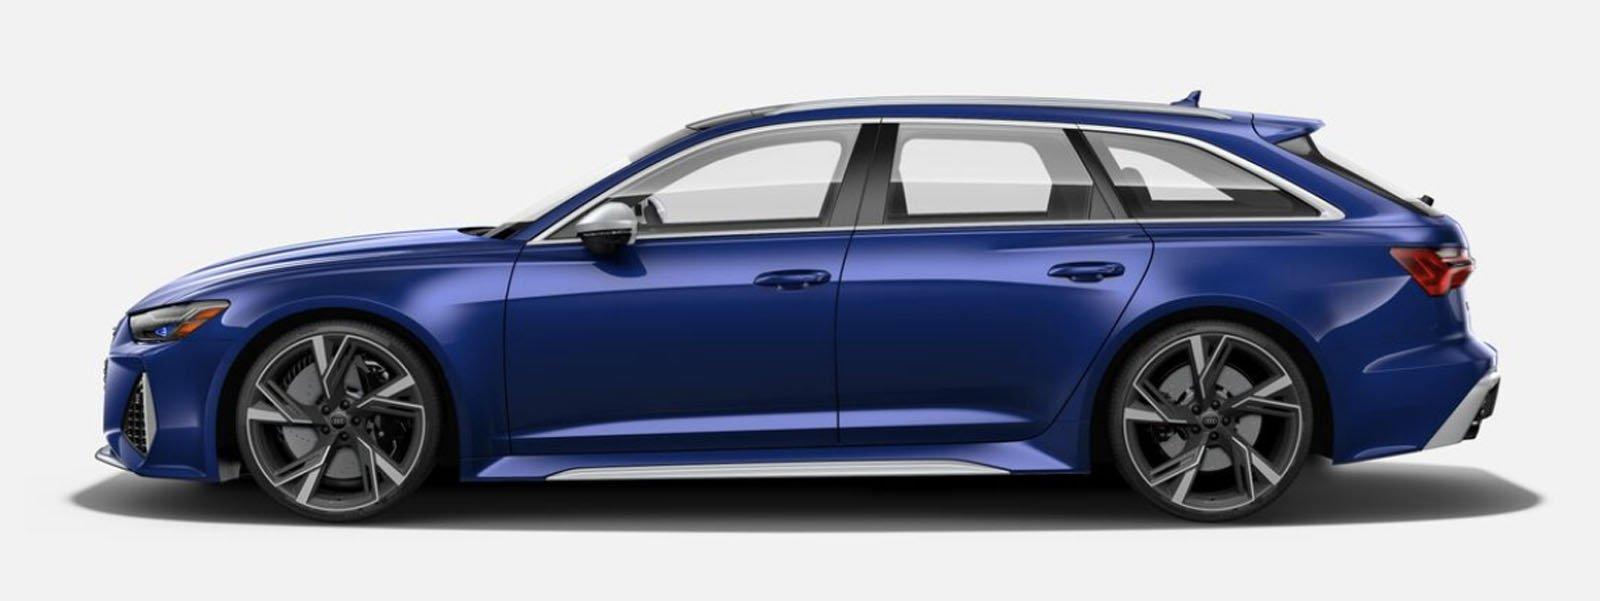 2021 Audi RS 6 Avant Navarra Blue